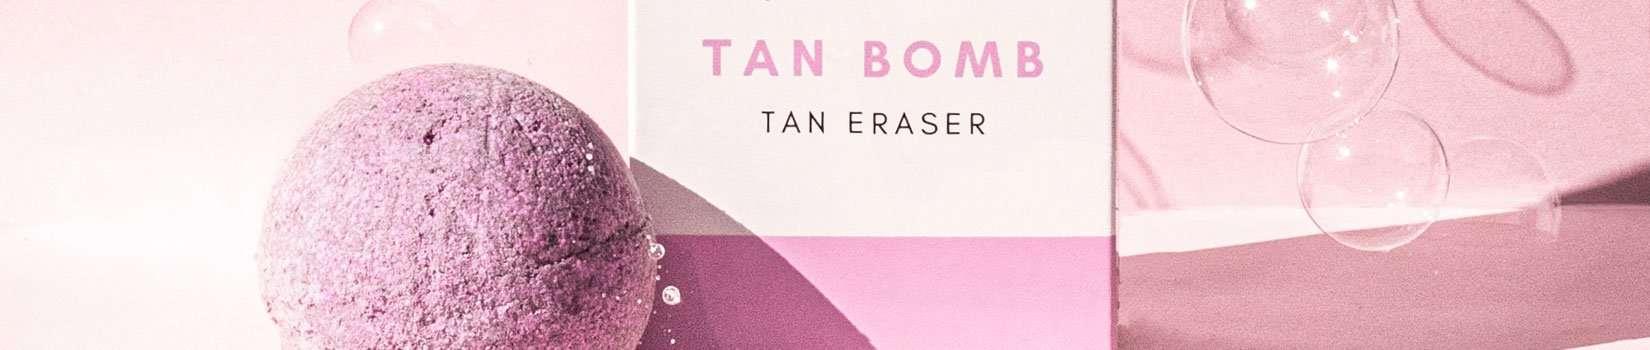 Tan Bomb